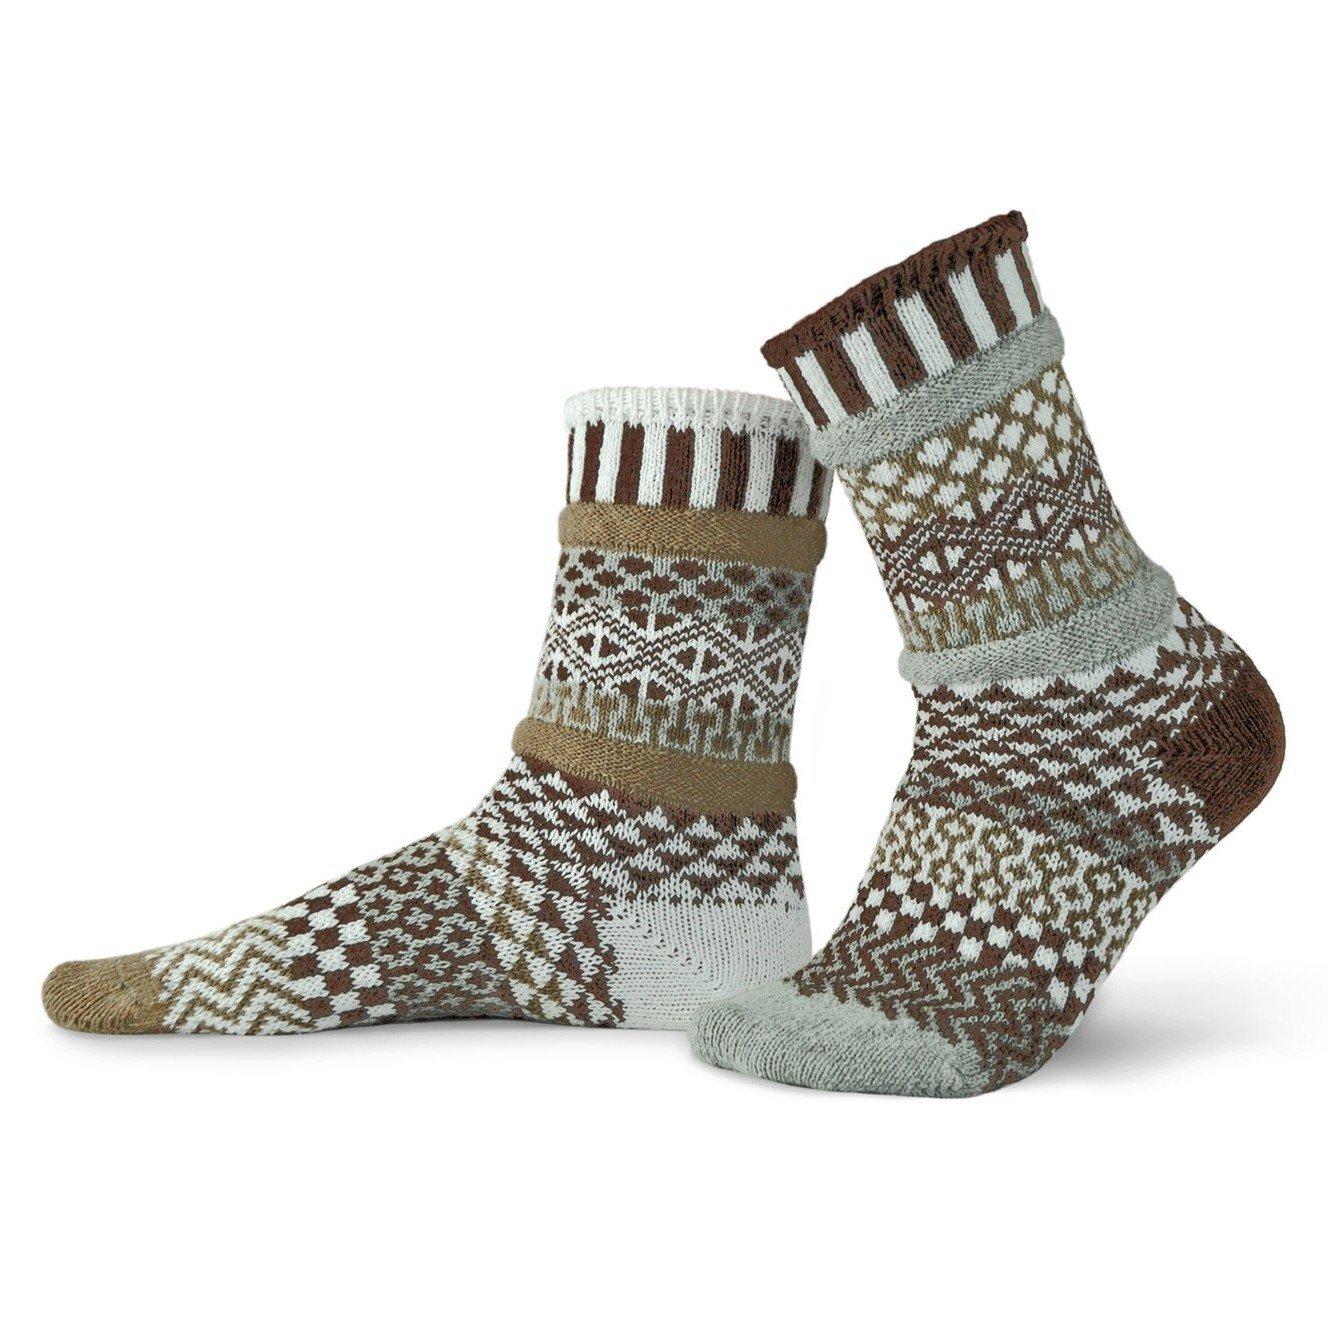 Pine Cone Adult Crew Socks